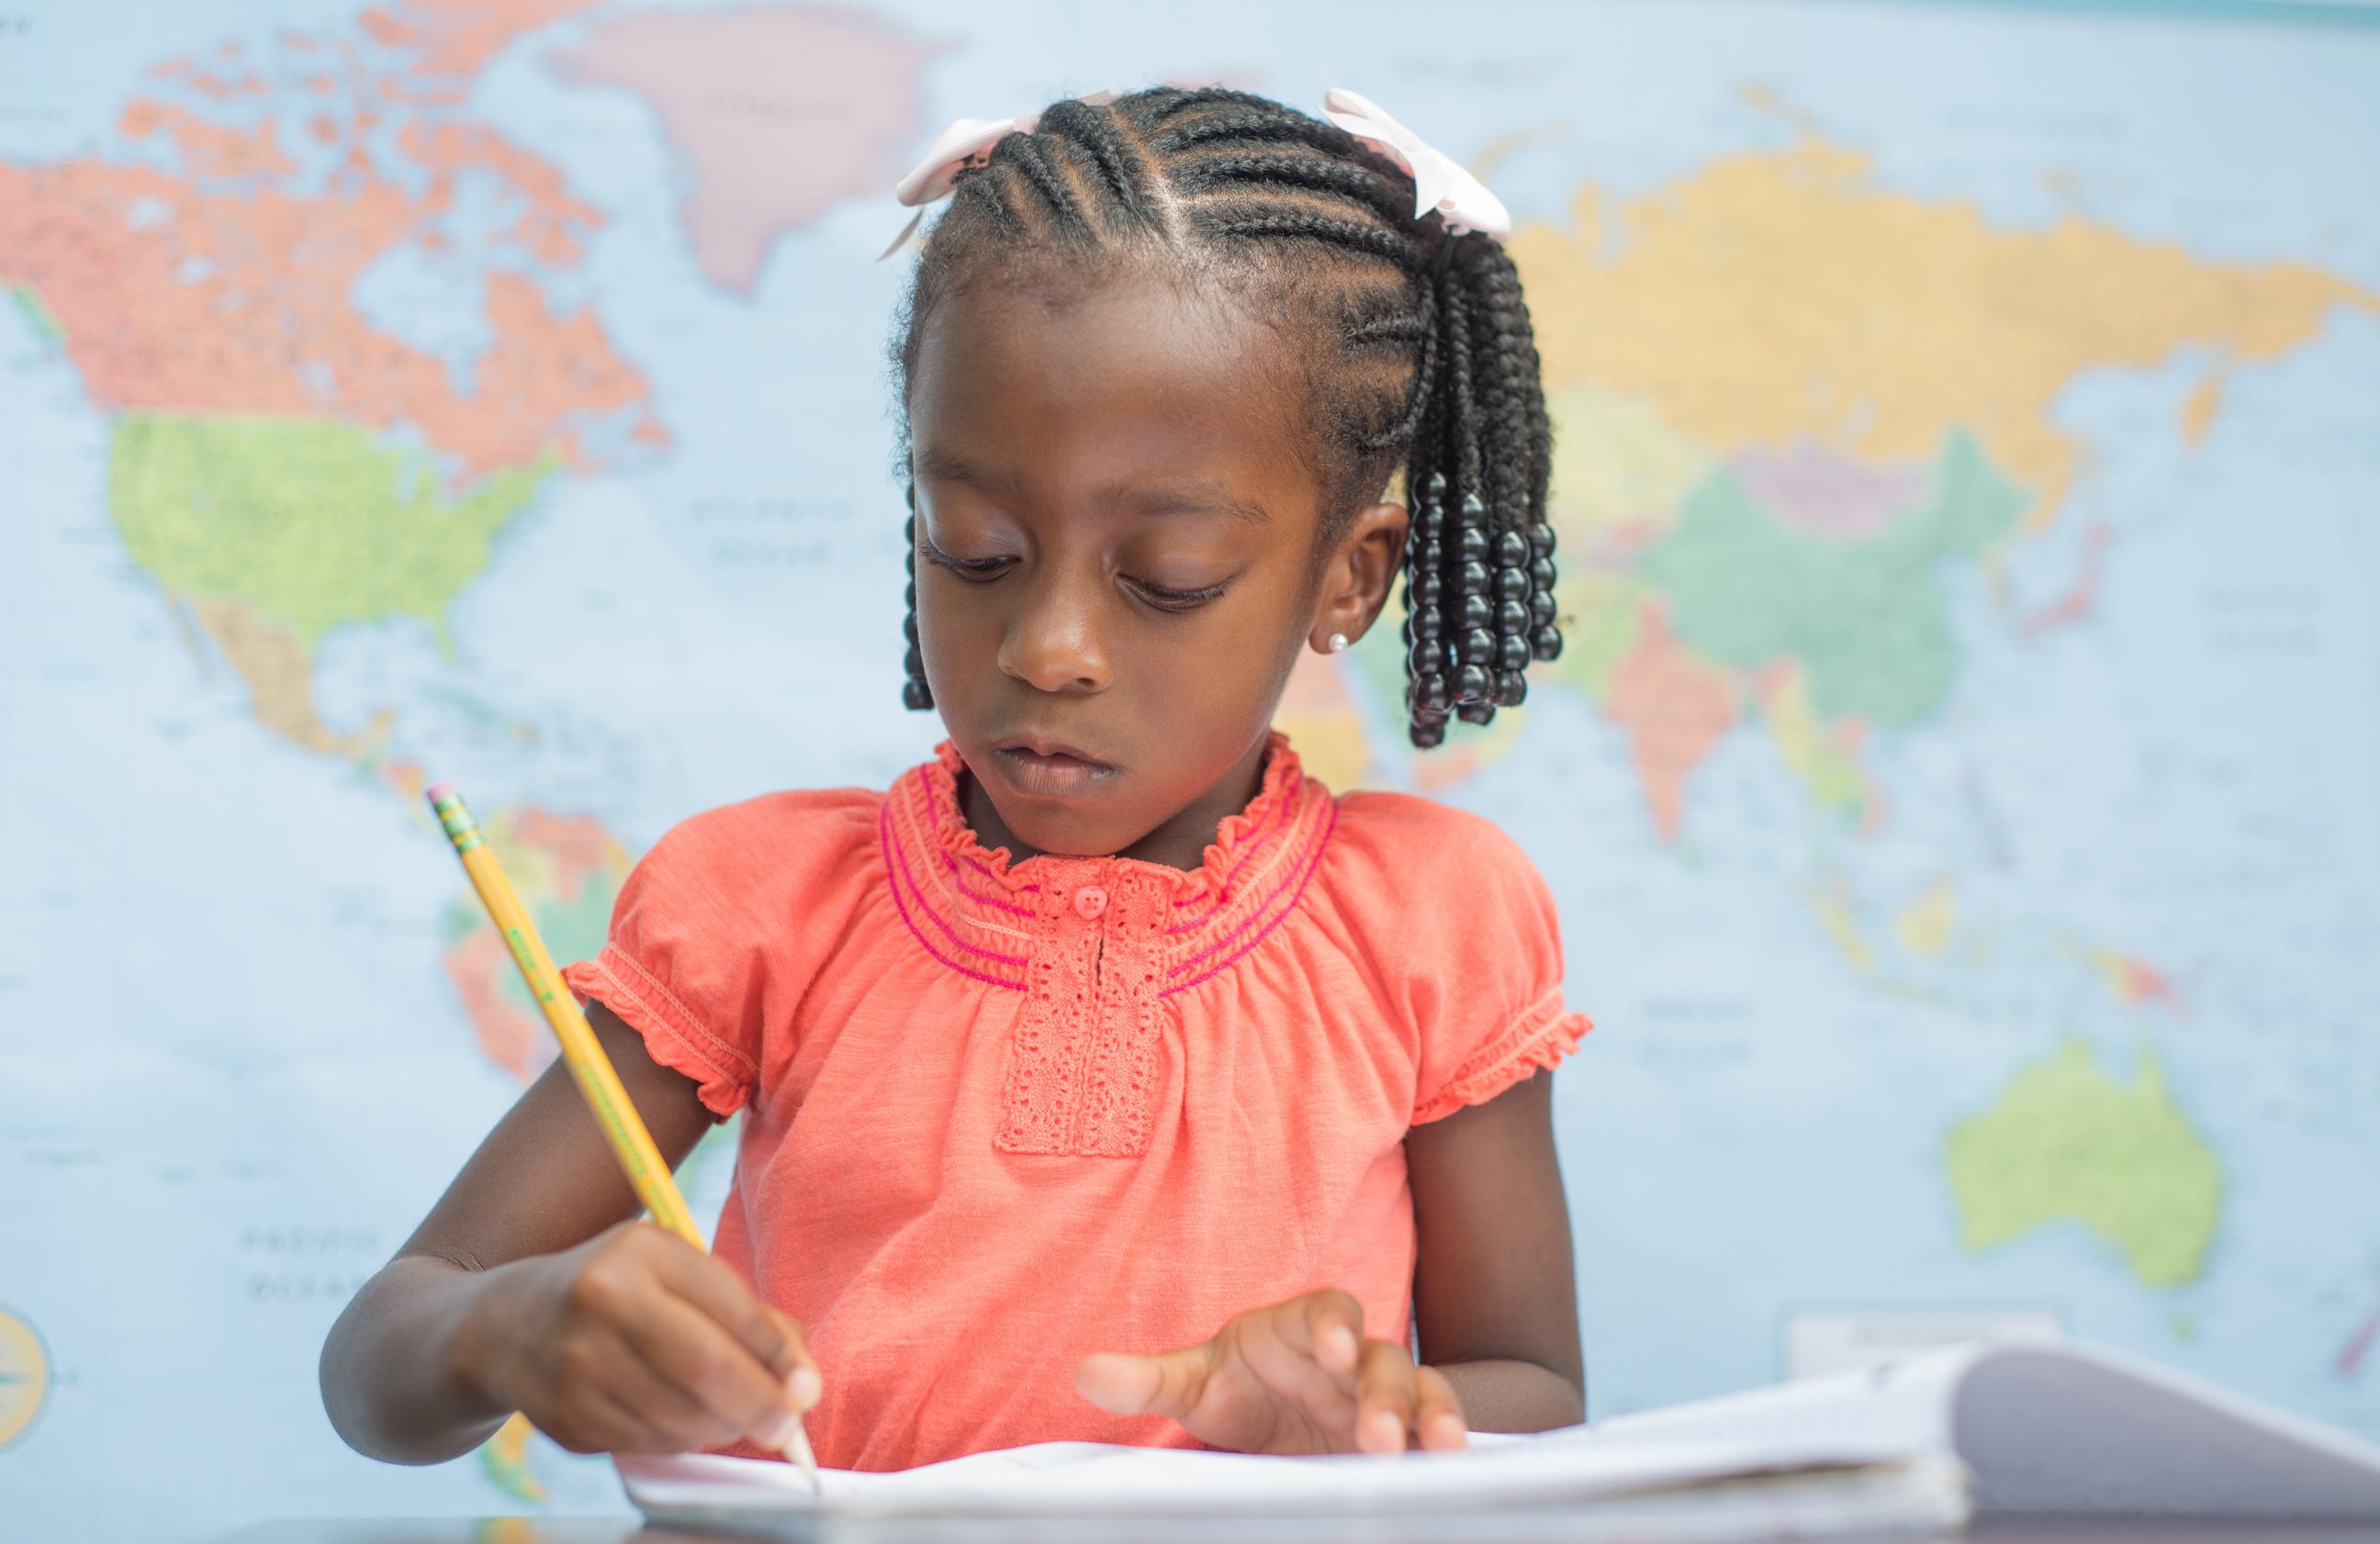 young preschool girl writing in notebook